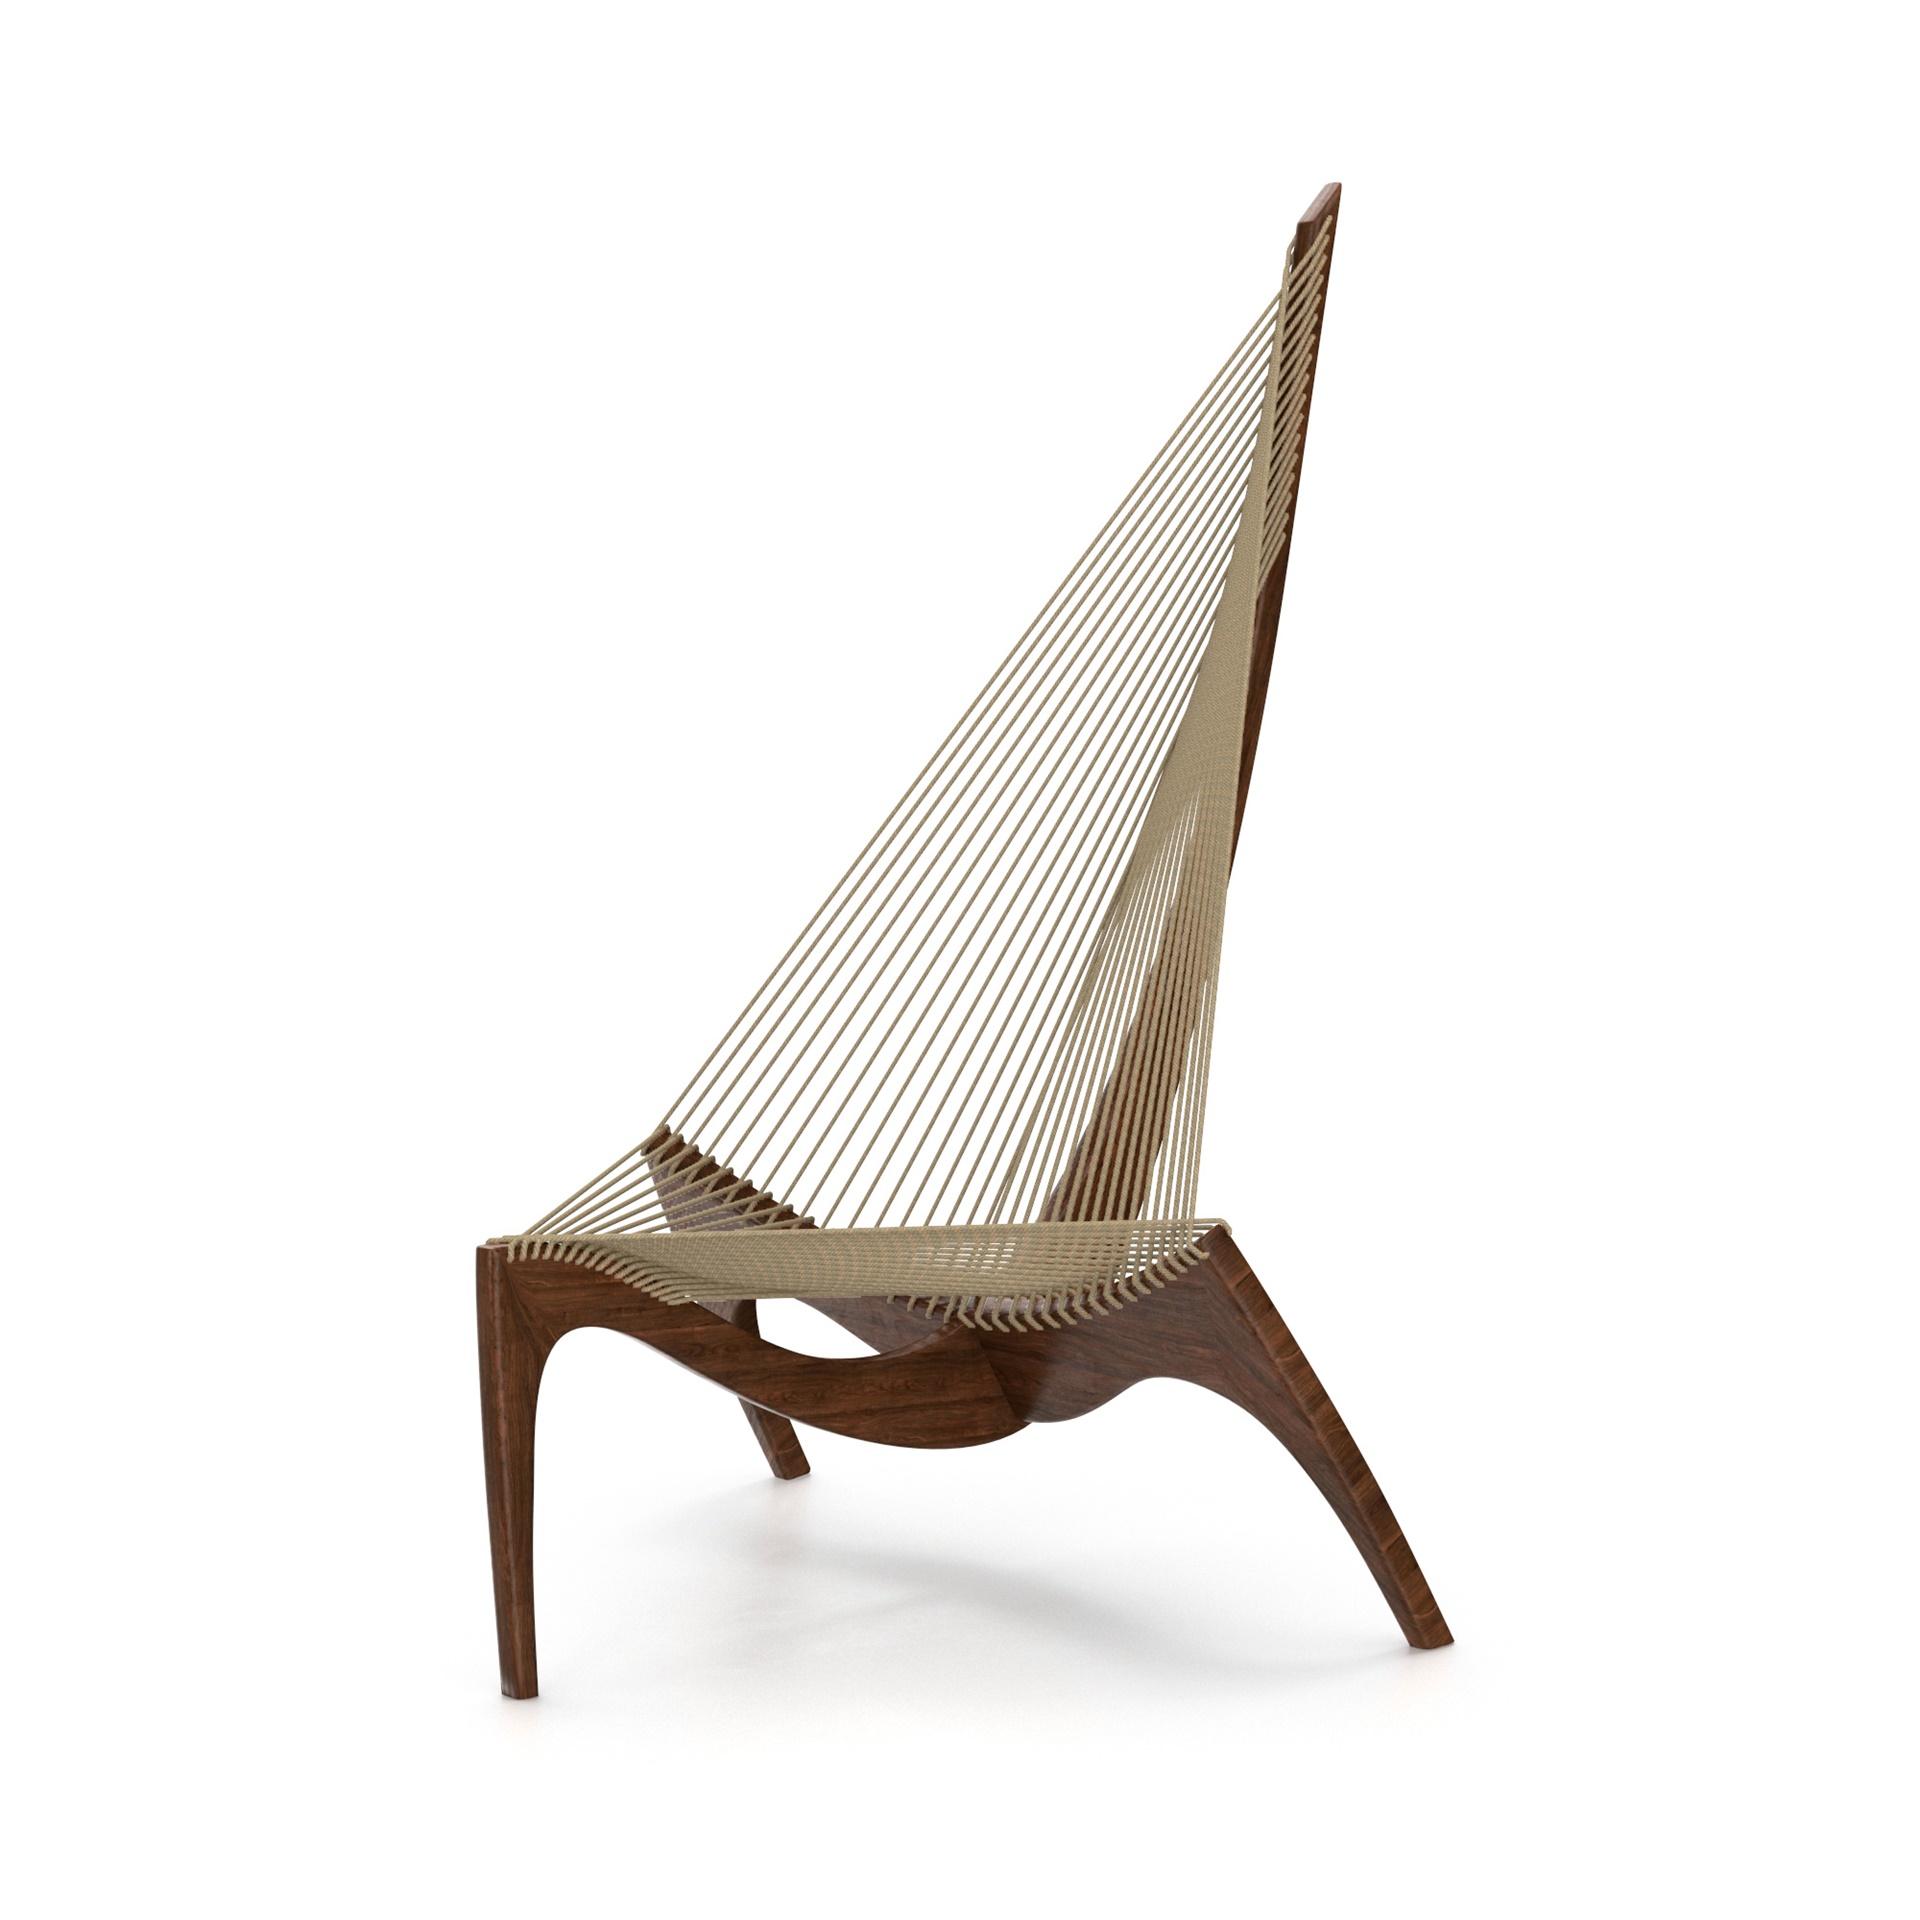 https://s3.amazonaws.com/inmod/products/magnified/jorgen-hovelskov-harp-chair/gl/ch9223-walnut-2.jpg